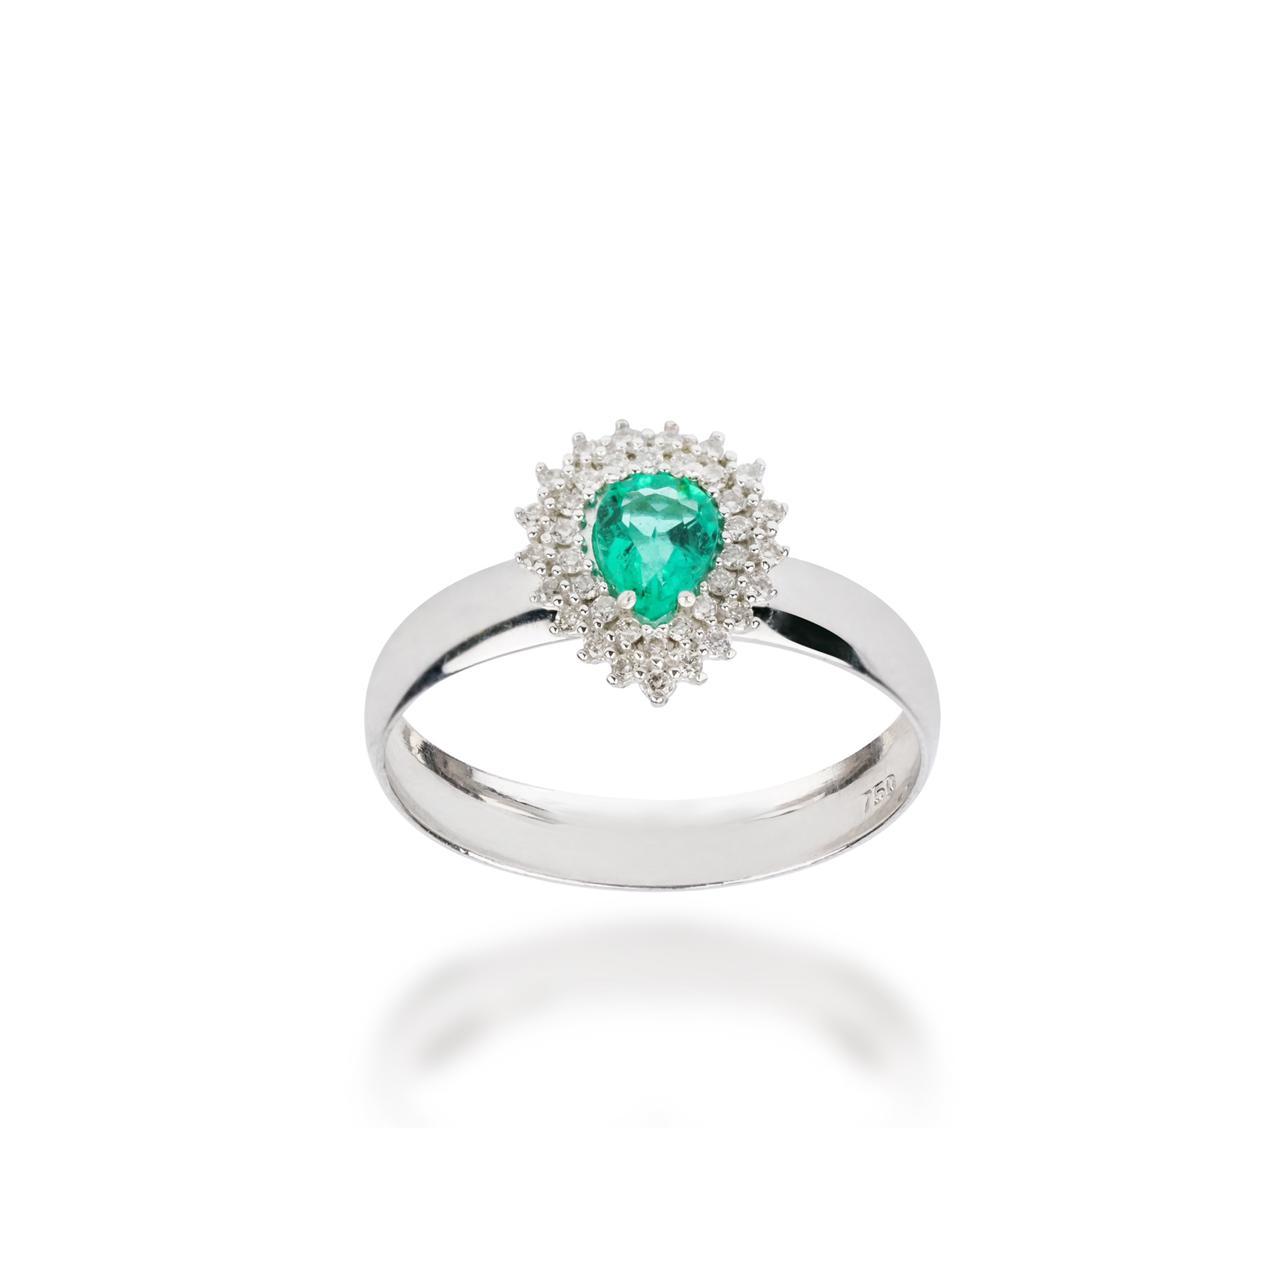 Anel Gota Esmeralda e Diamantes Ouro branco 18k